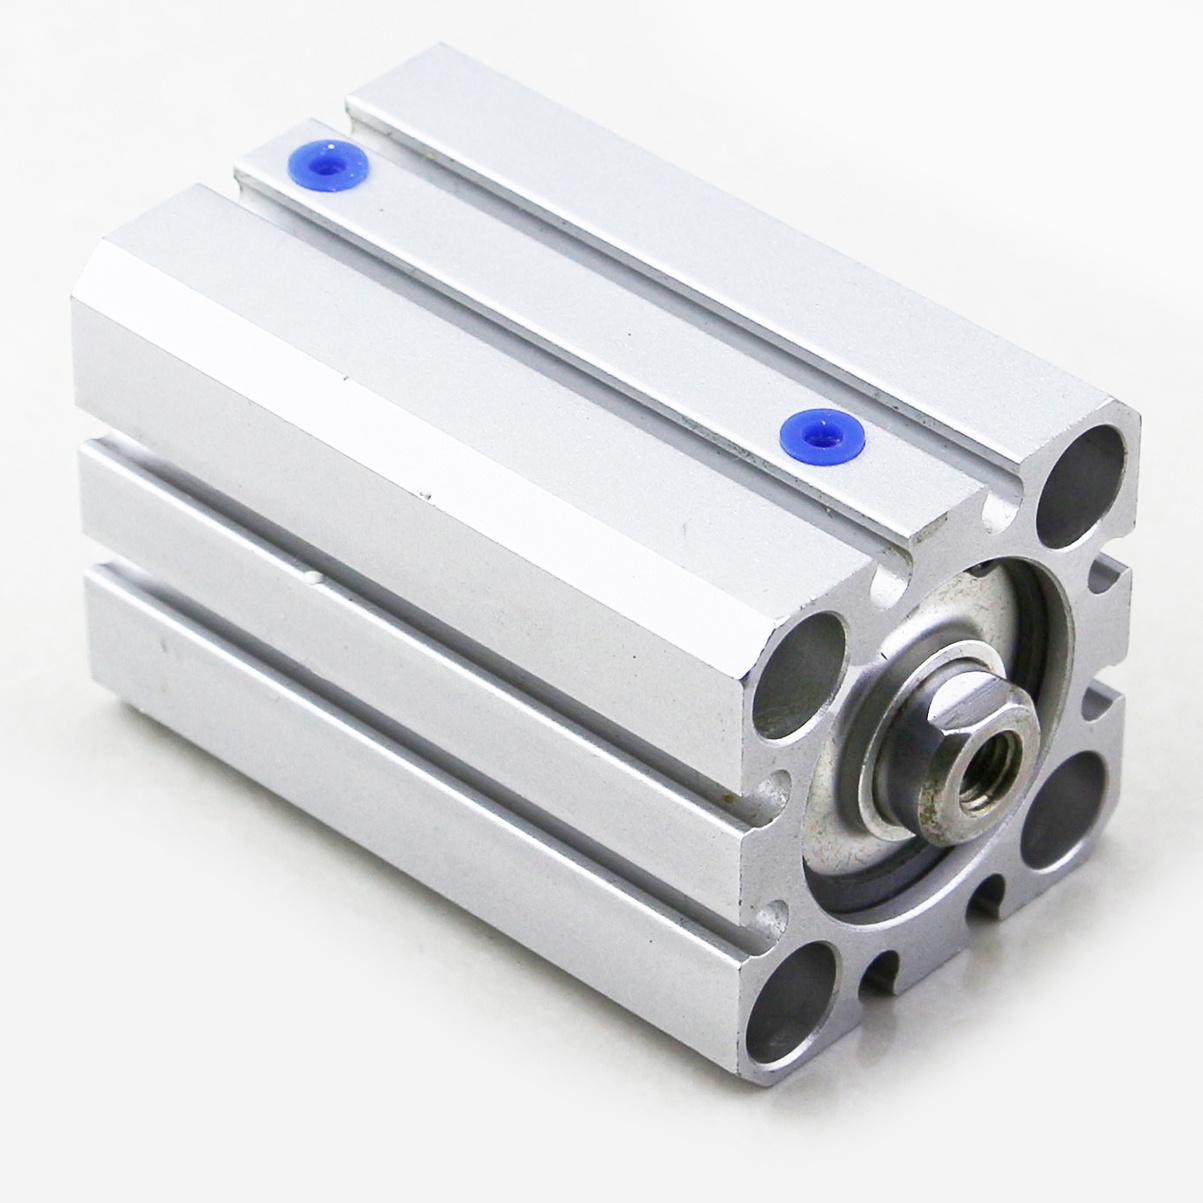 SMC Type Compressed Cylinder